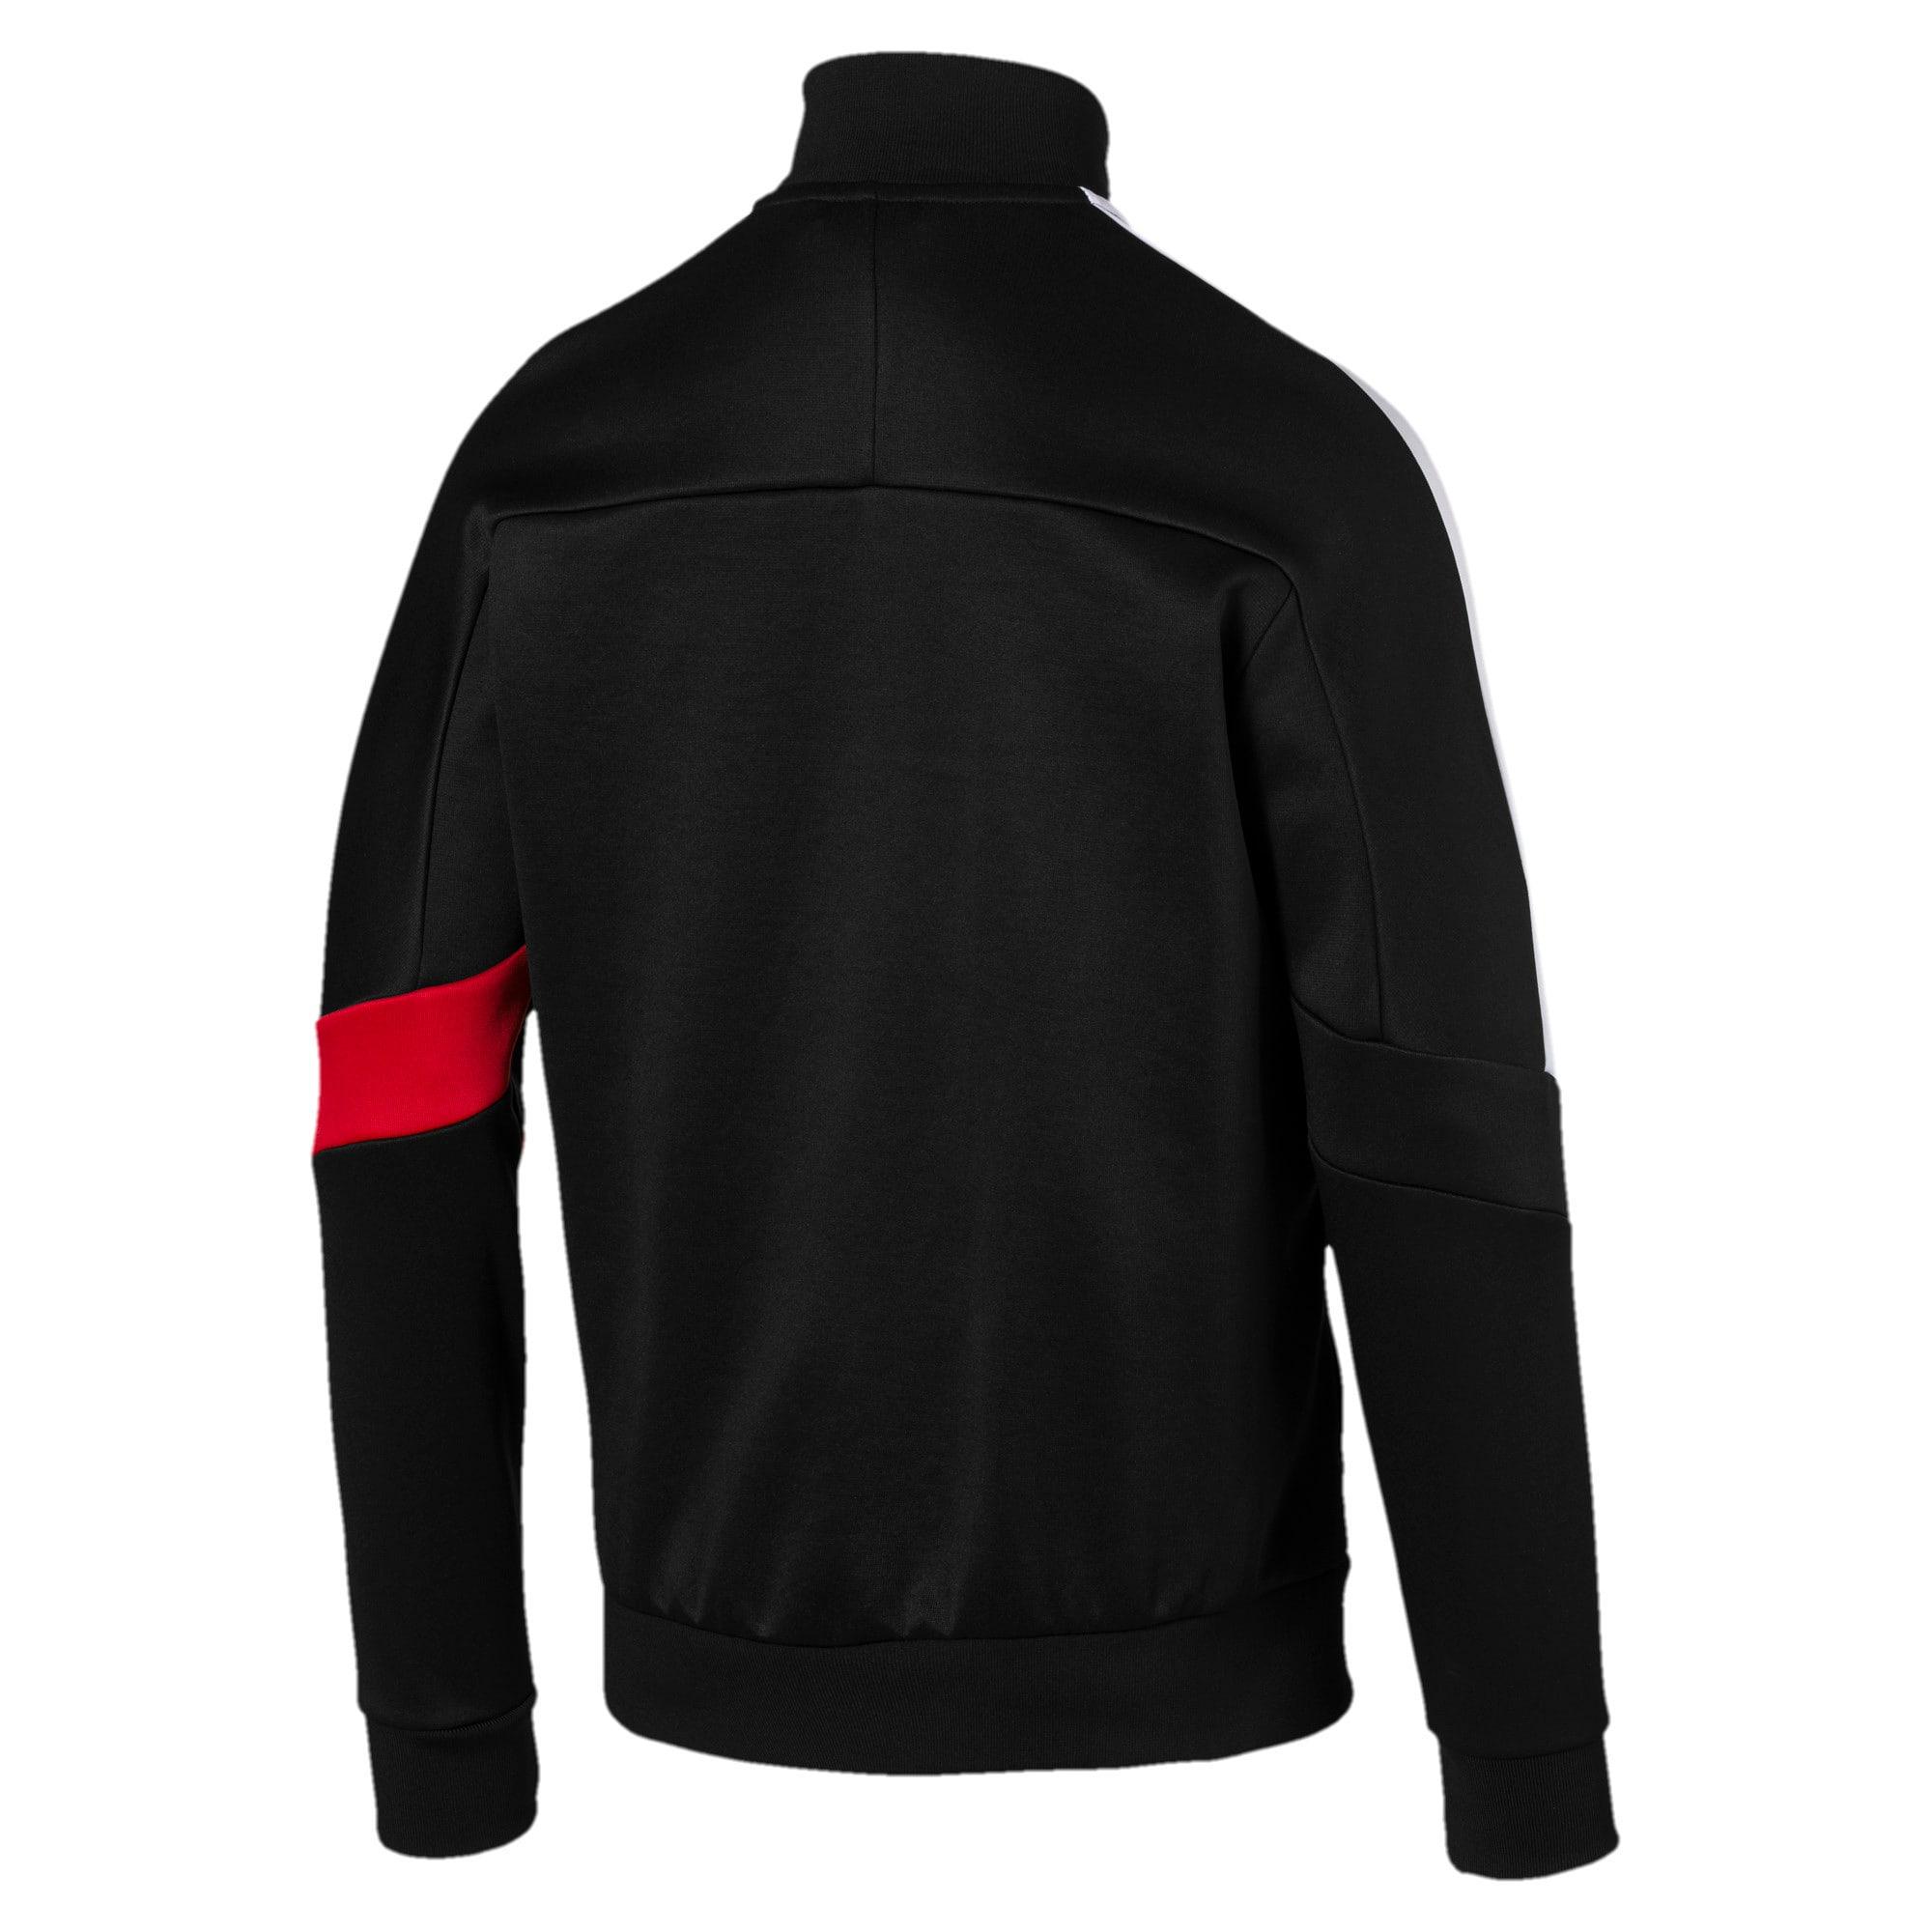 Thumbnail 3 of Scuderia Ferrari Men's T7 Track Jacket, Puma Black, medium